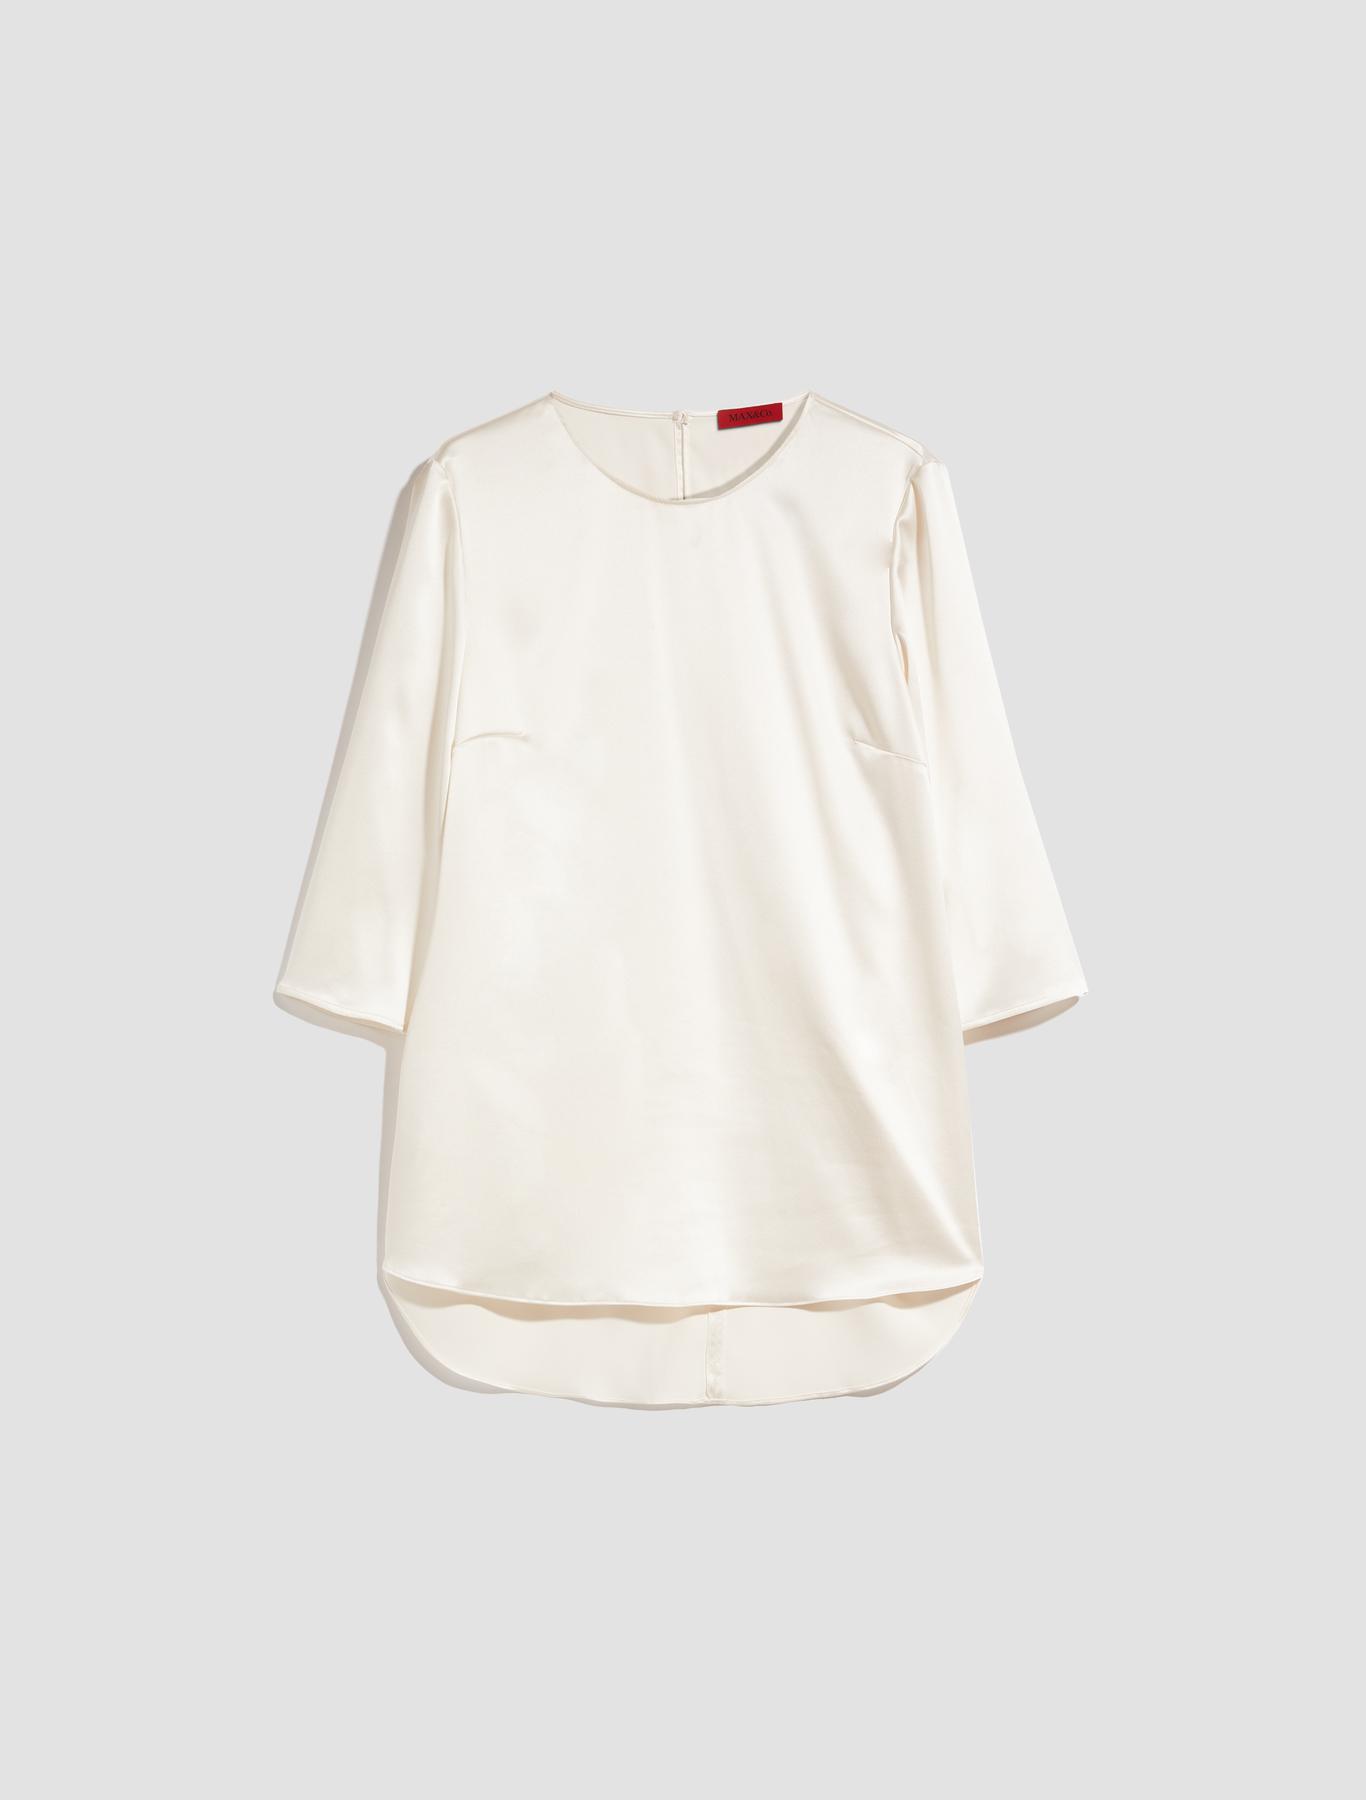 ab30174fe2da0b Silk satin blouse, ivory - Max&Co.